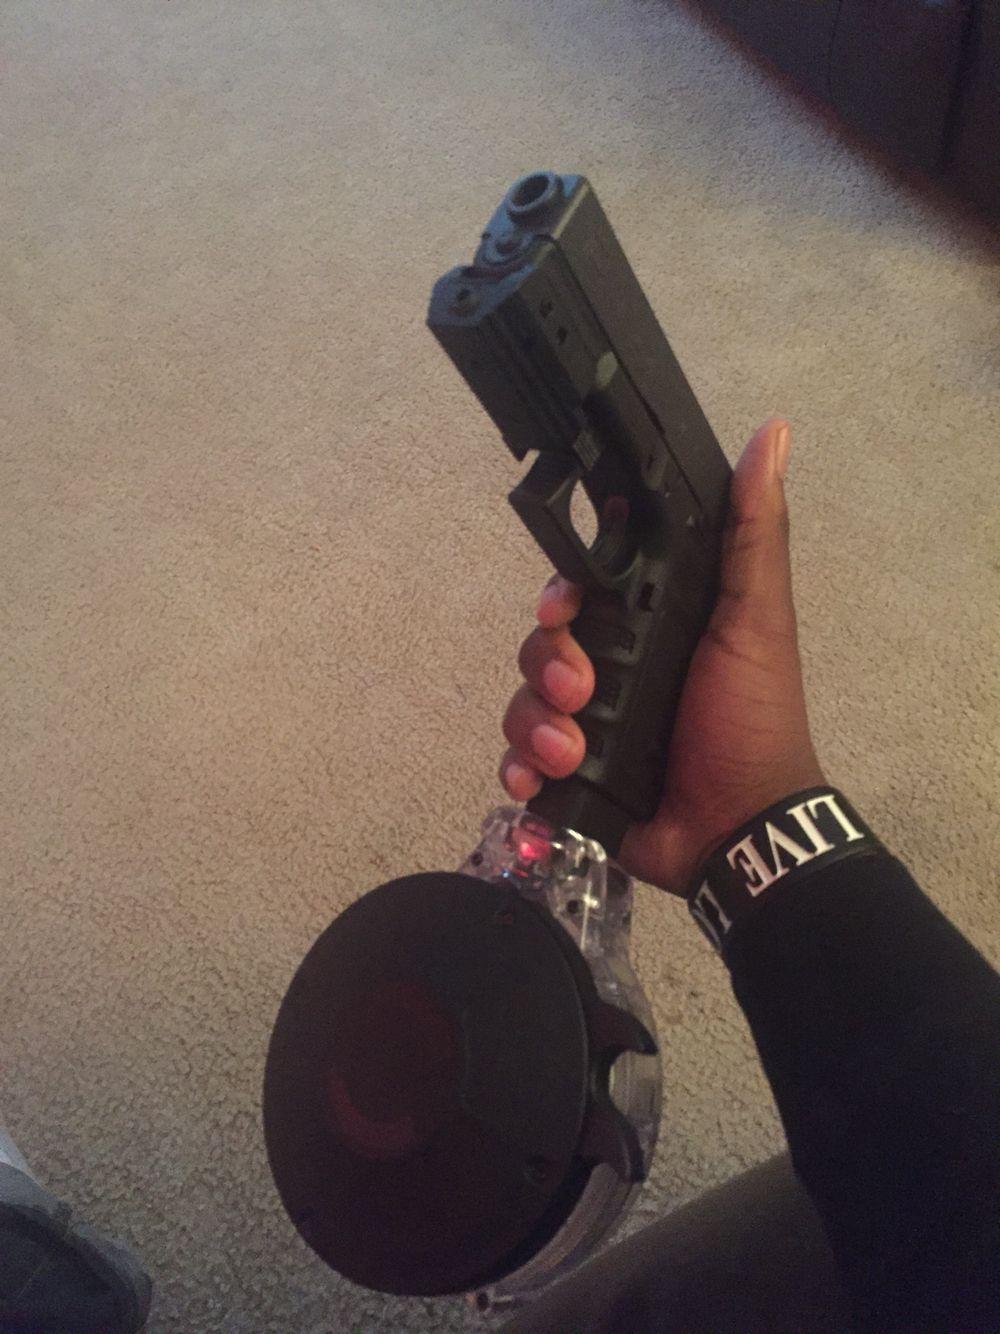 50 round magazine for glock 9mm